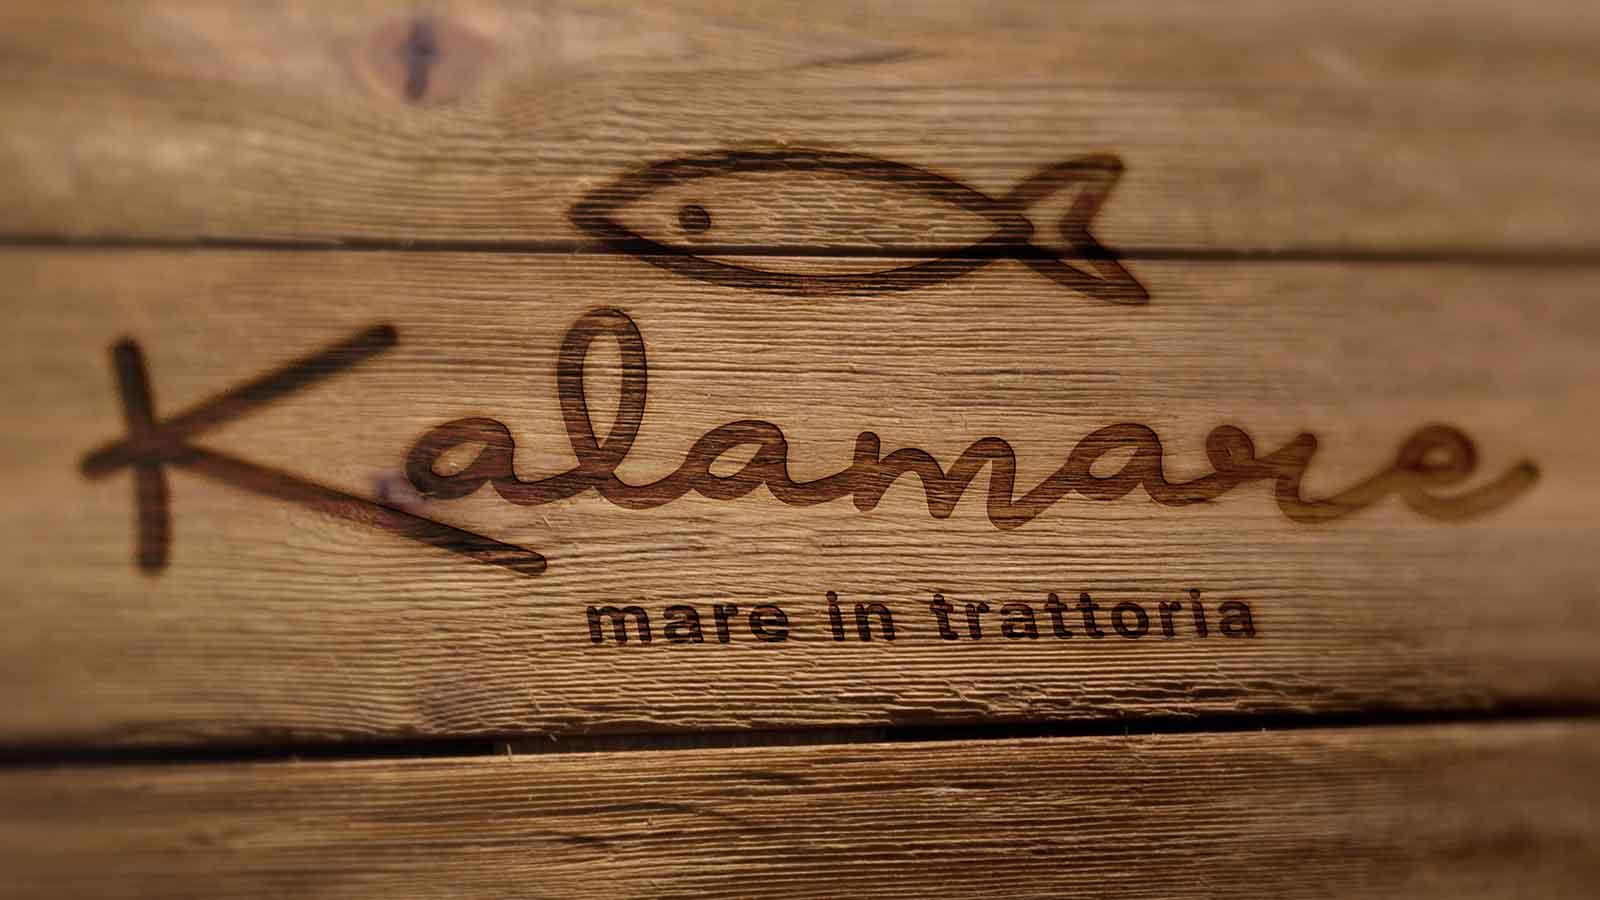 kalamare-reggio-calabria-bisestyle-gallery-1